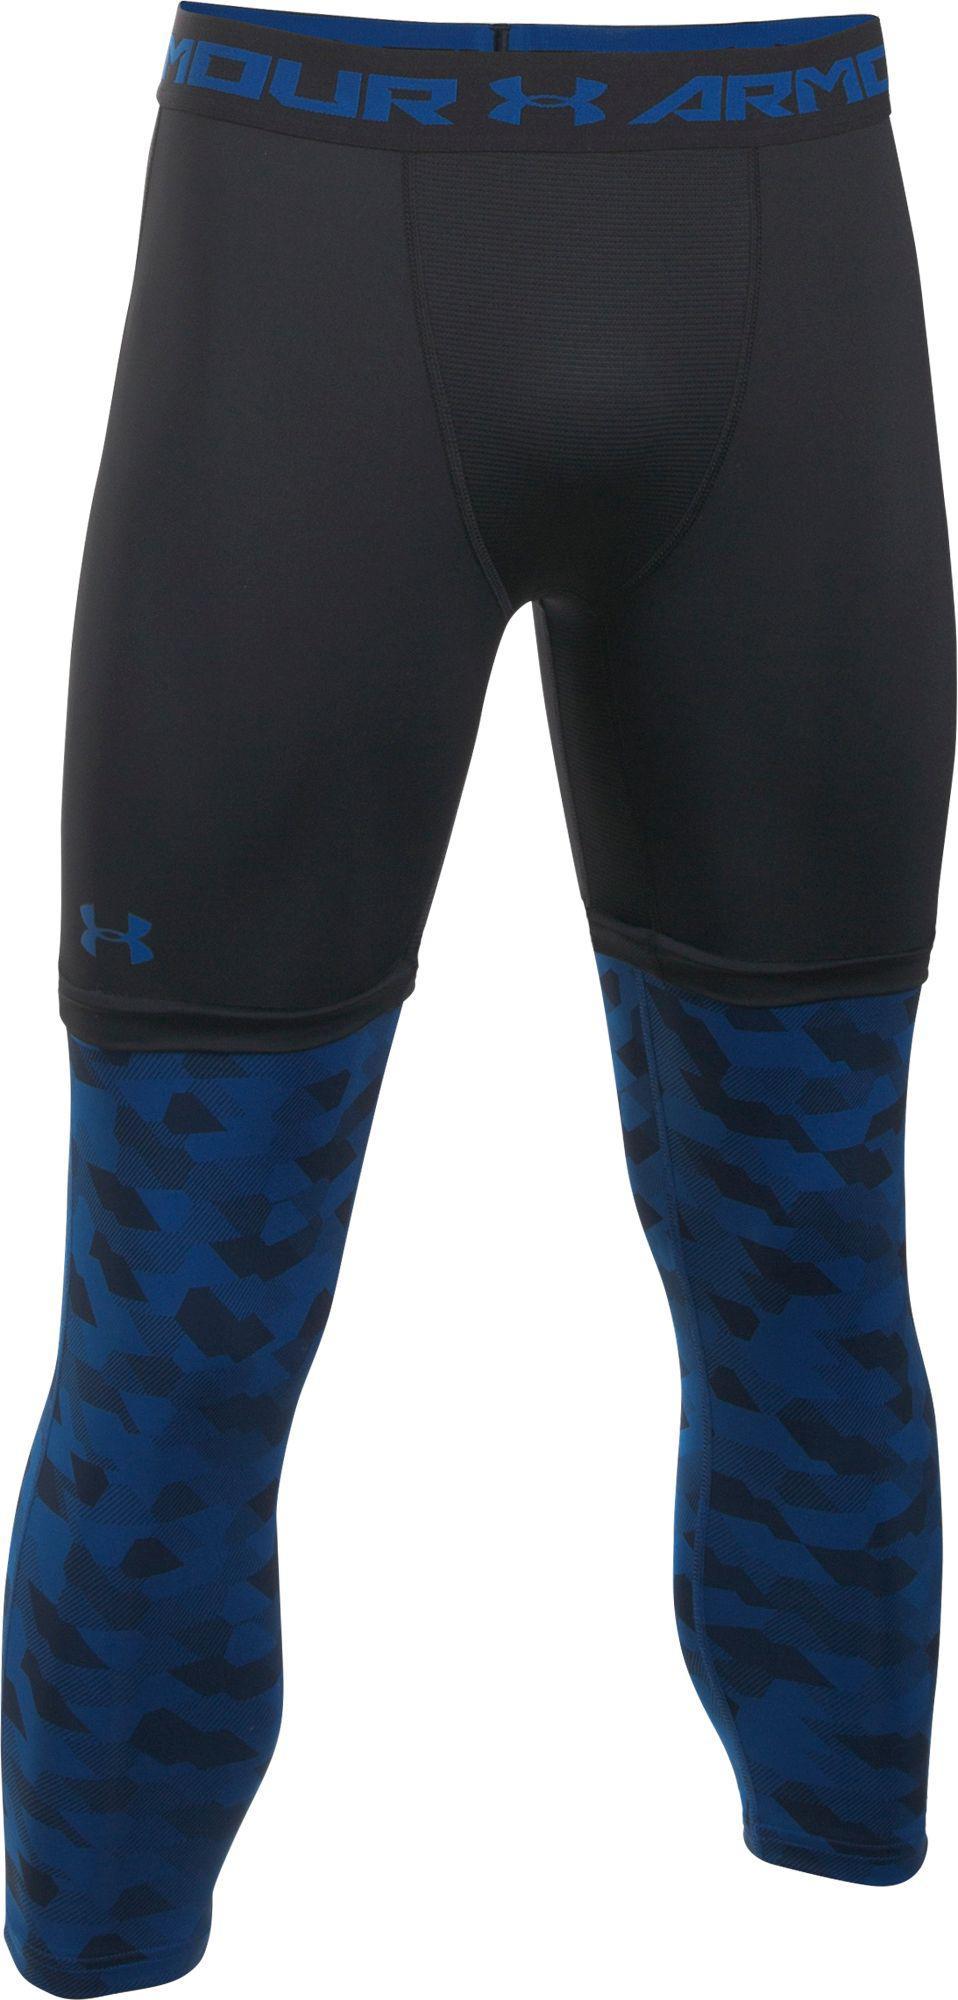 Under Armour Synthetic Sc30 Three Quarter Length Basketball Leggings In Black For Men Lyst